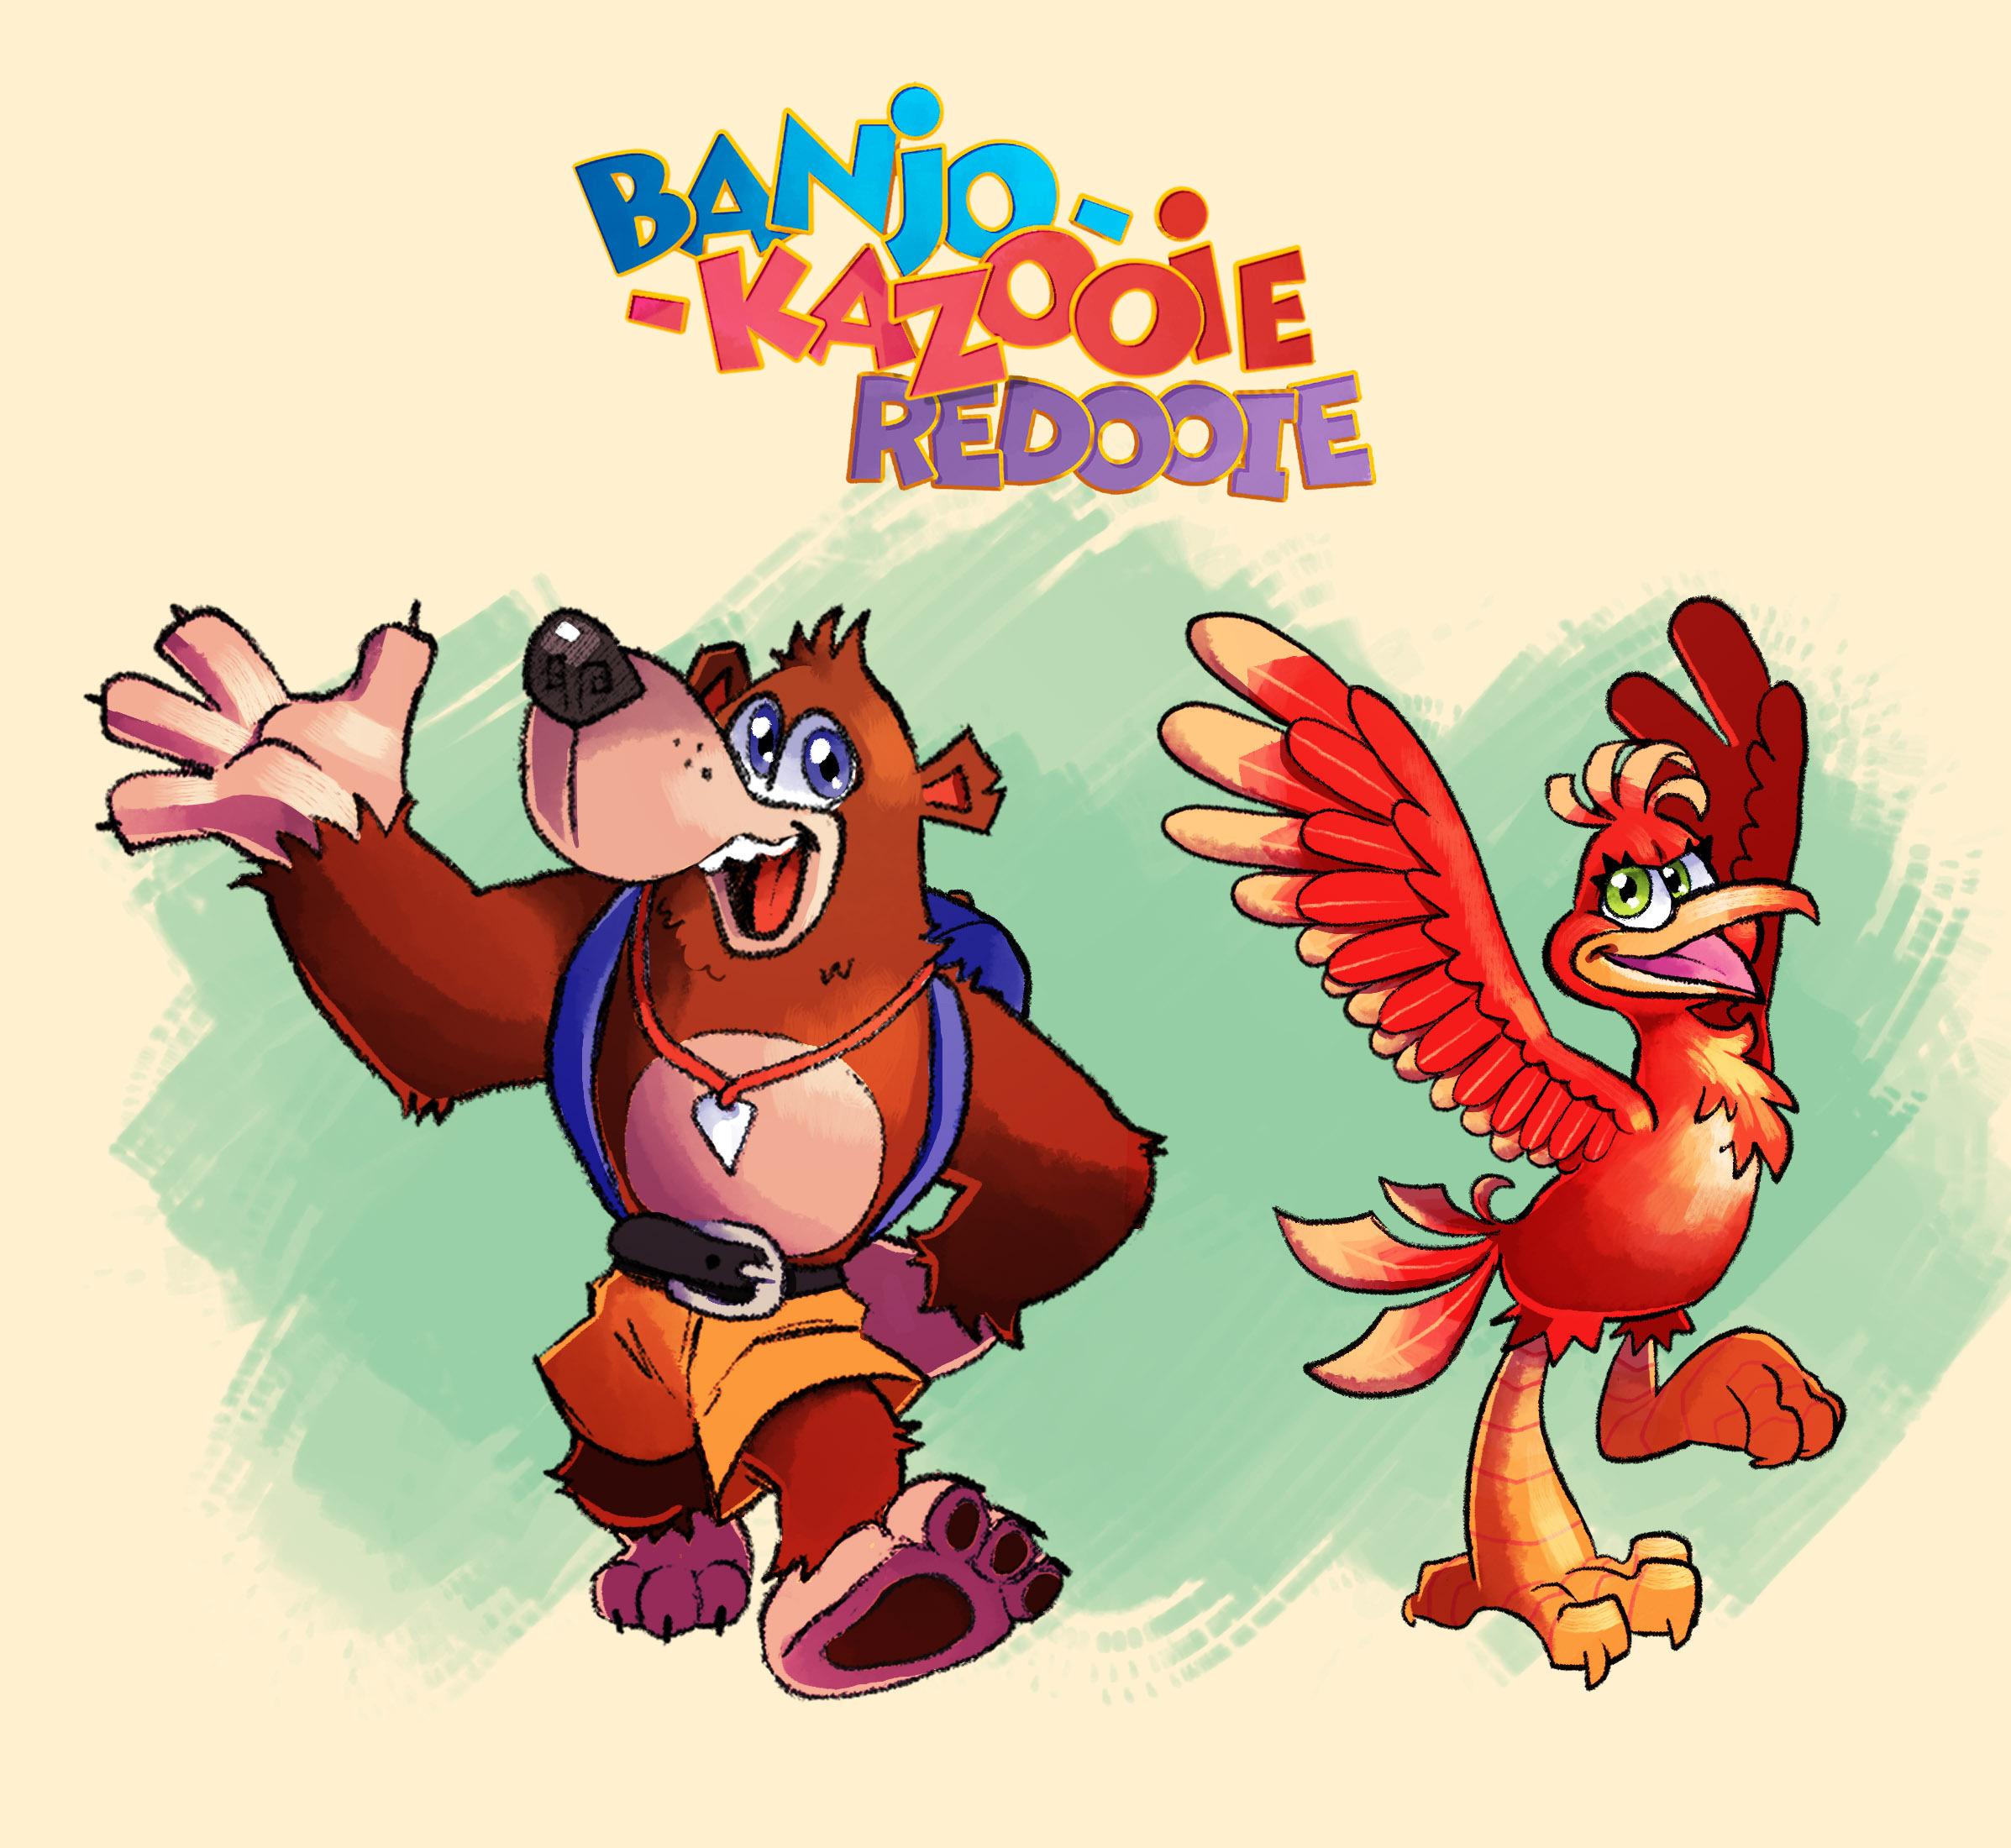 Banjo Kazooie Redooie